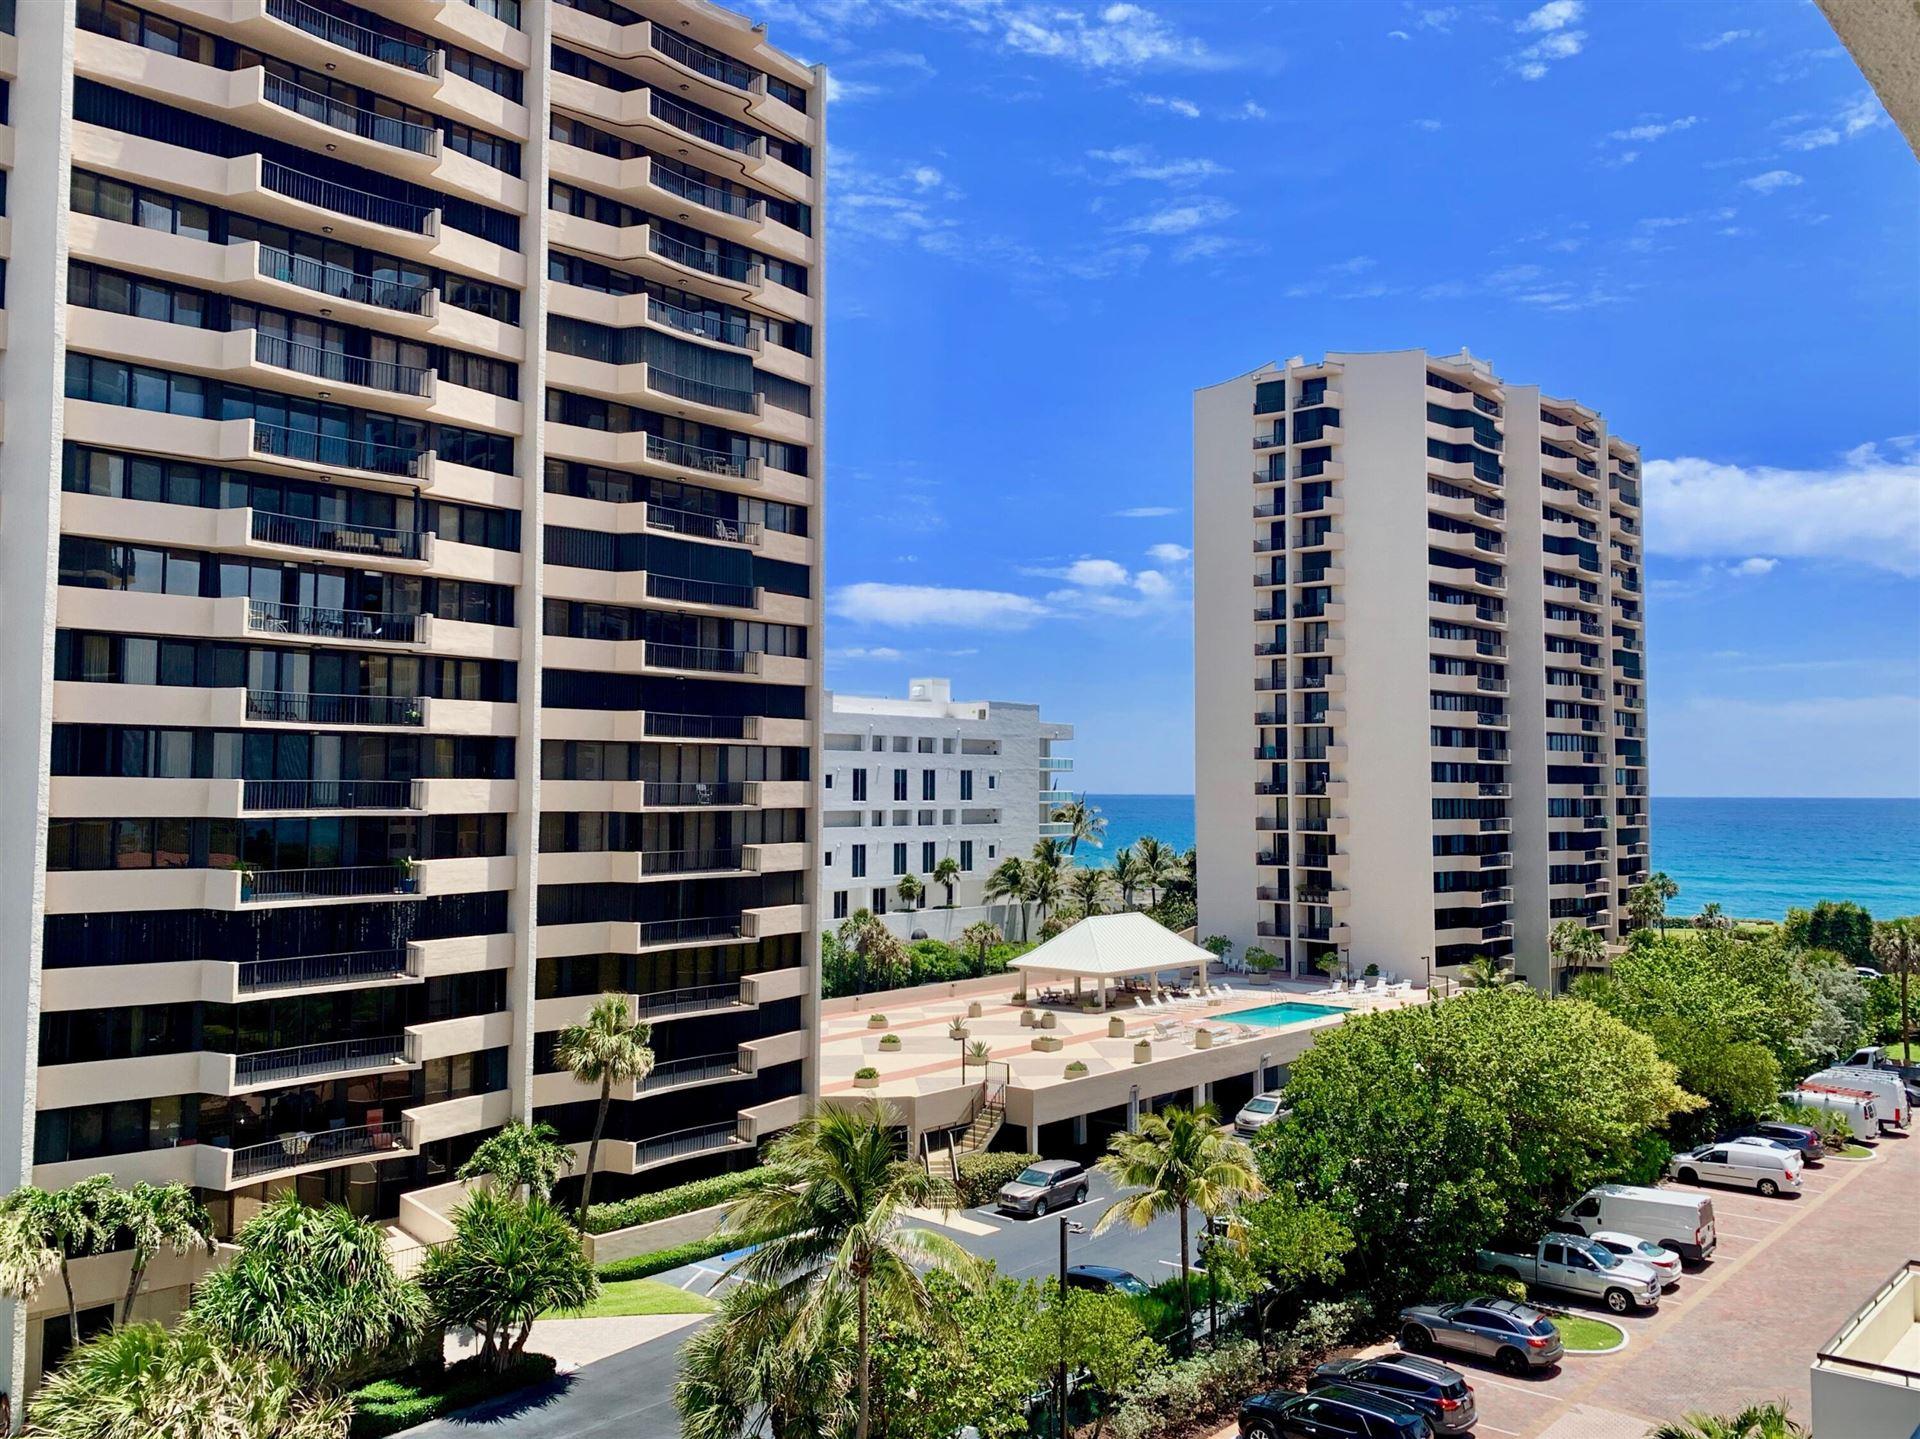 Photo for 4200 N Ocean Drive #1-504, Singer Island, FL 33404 (MLS # RX-10746788)